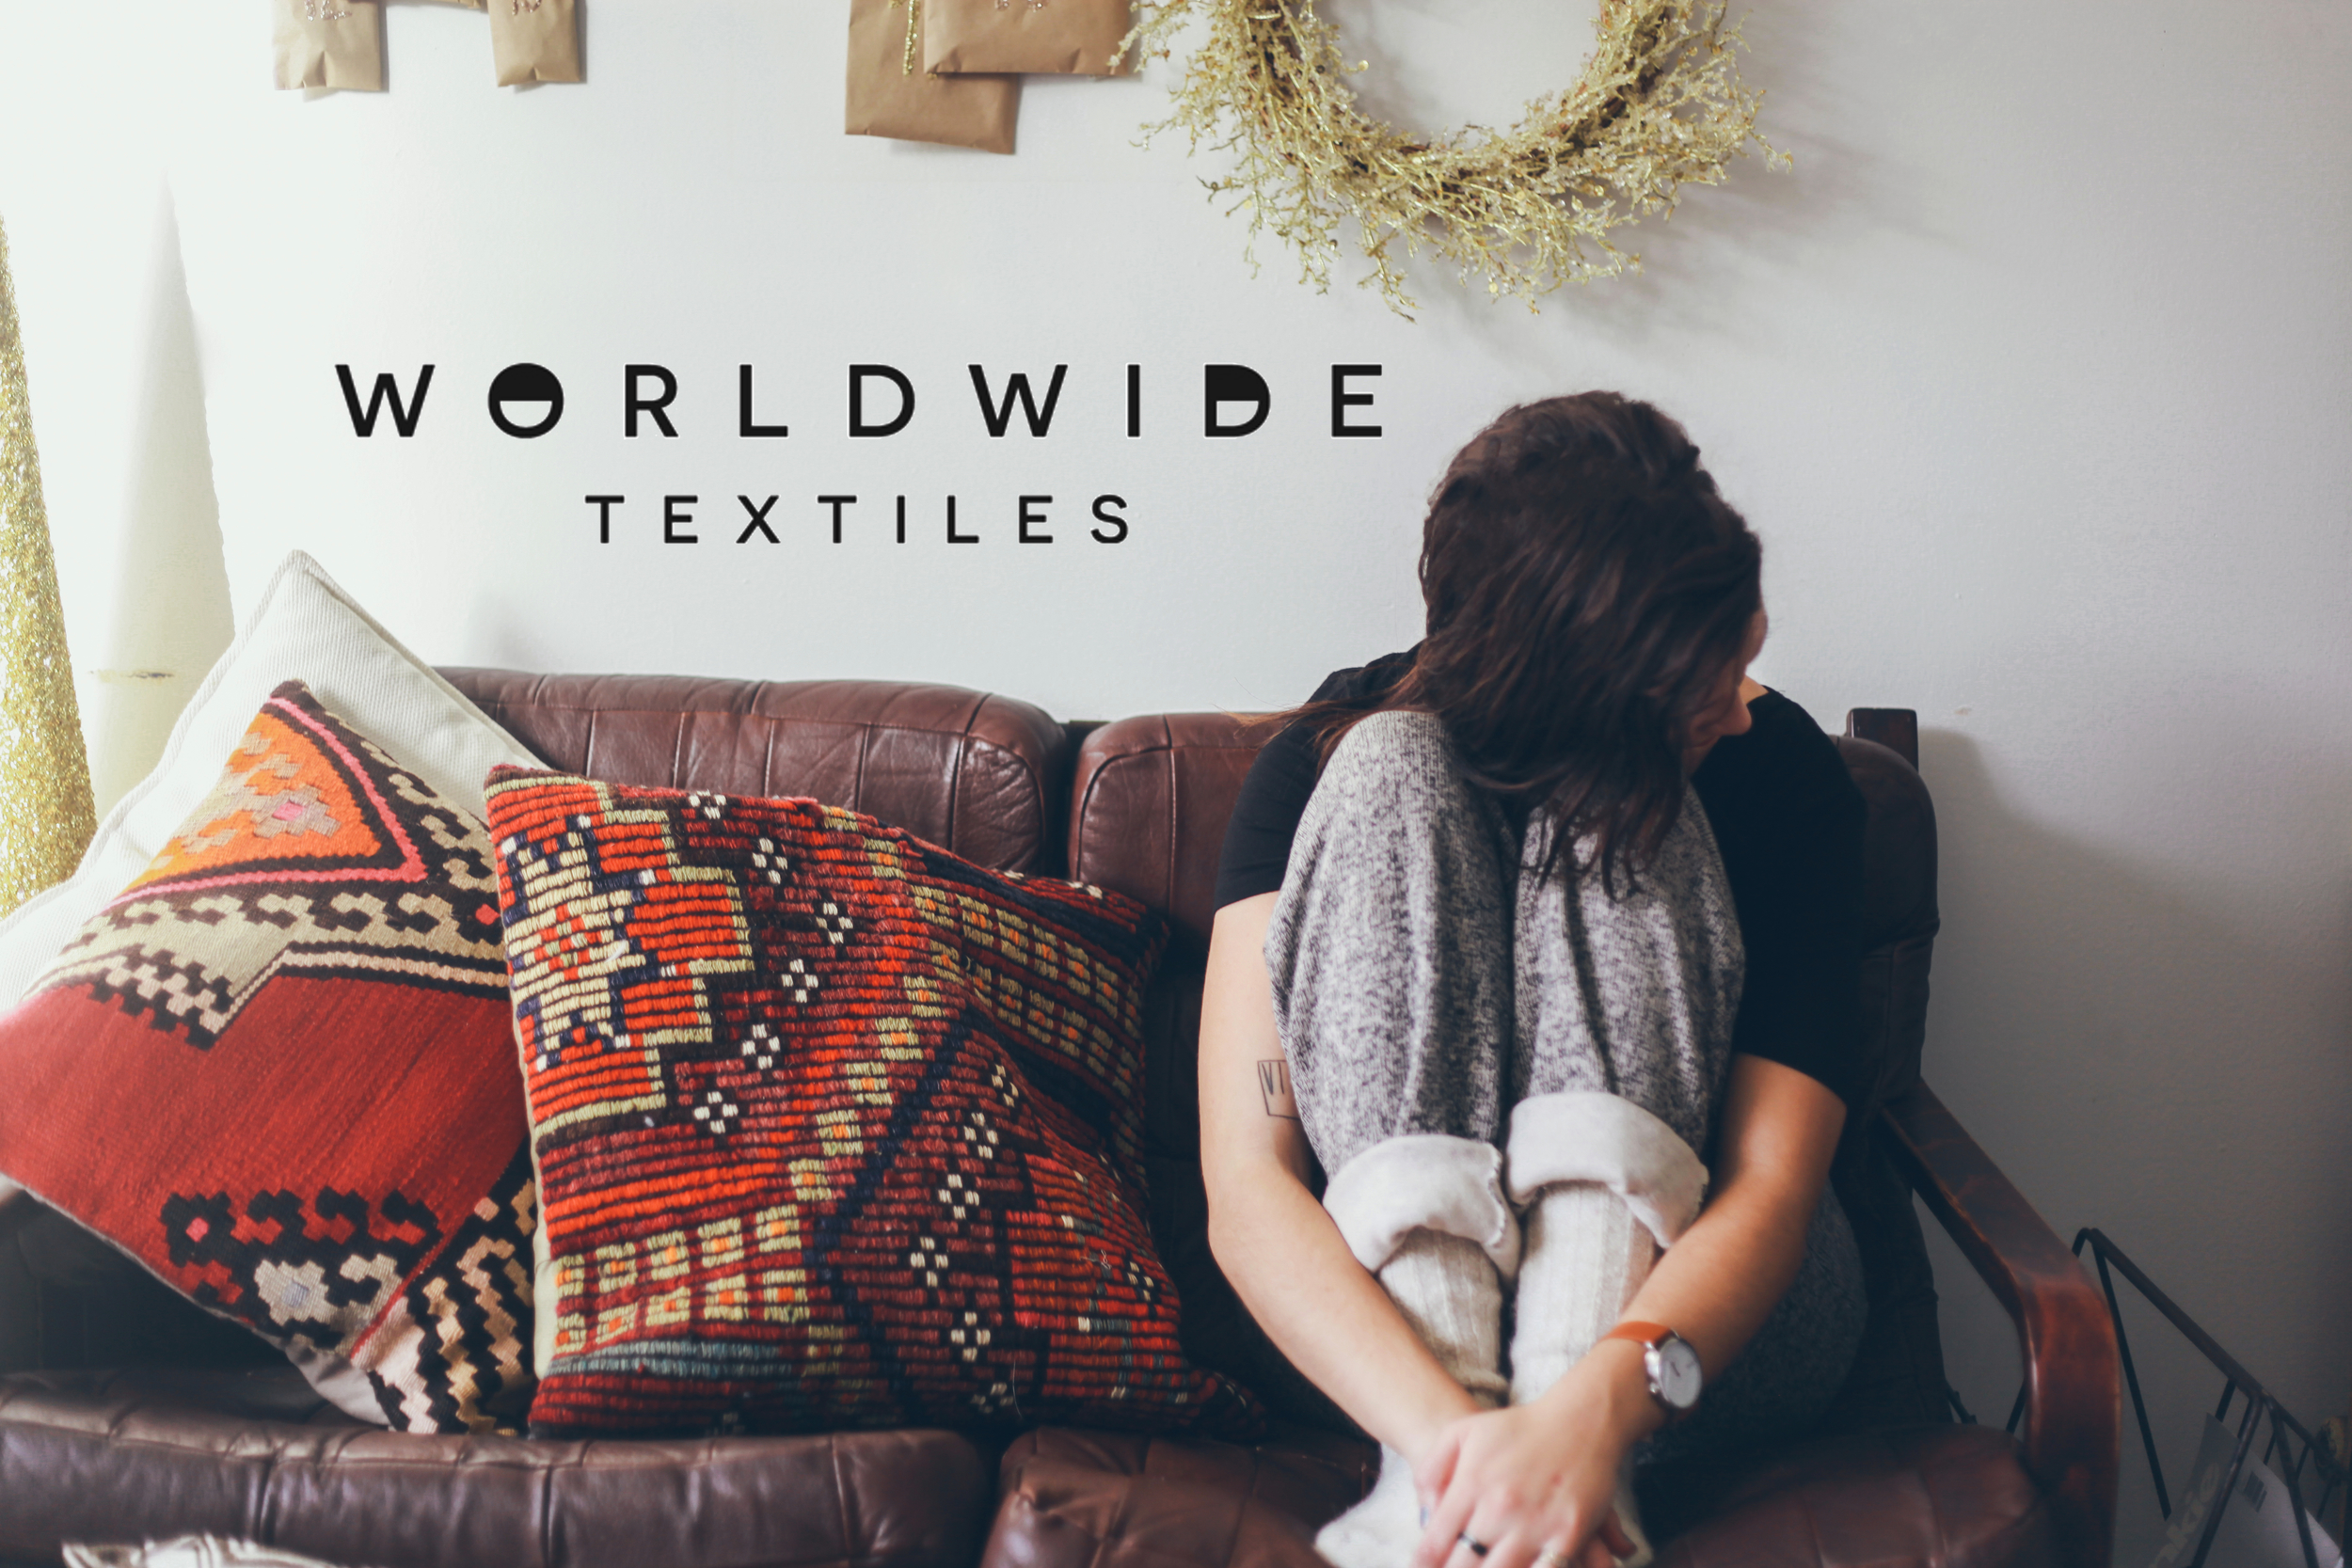 worldwidetextiles.jpg